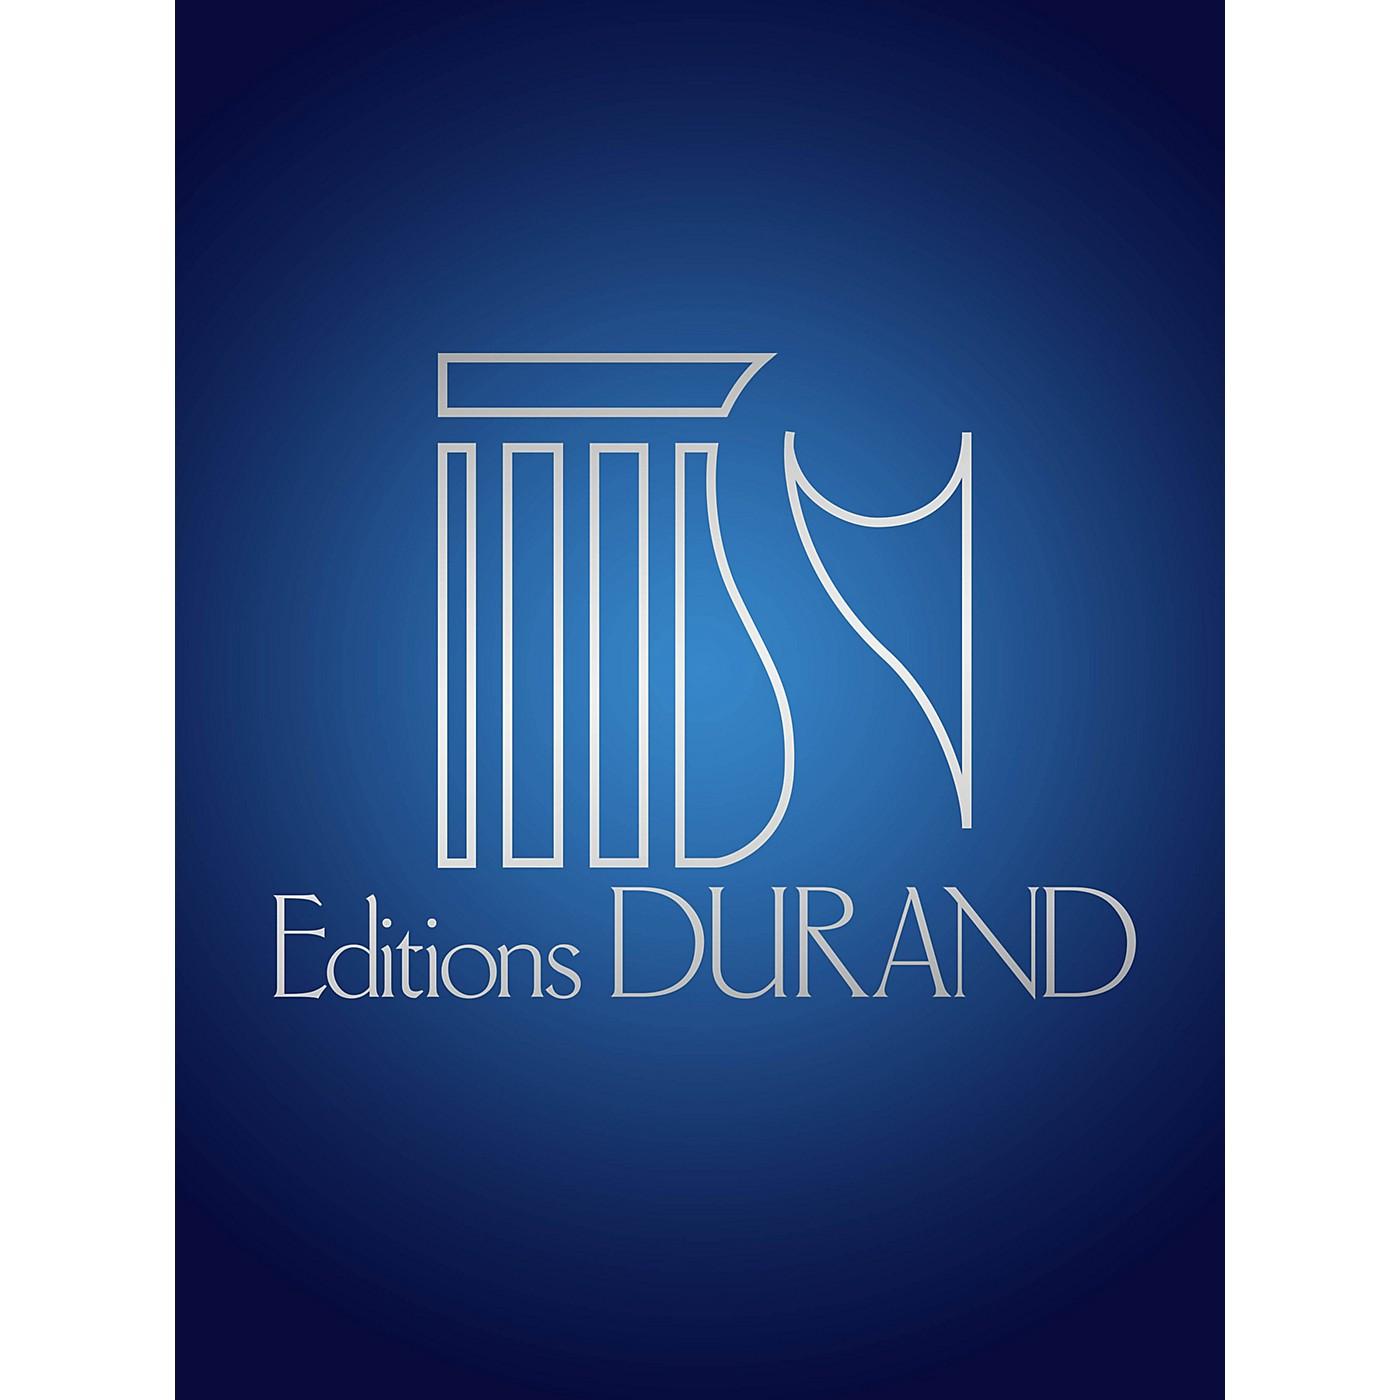 Hal Leonard Etudes De Peaux No4: Mit (for The Zarb - A Drum-like Percussion Instrument) Editions Durand Series thumbnail